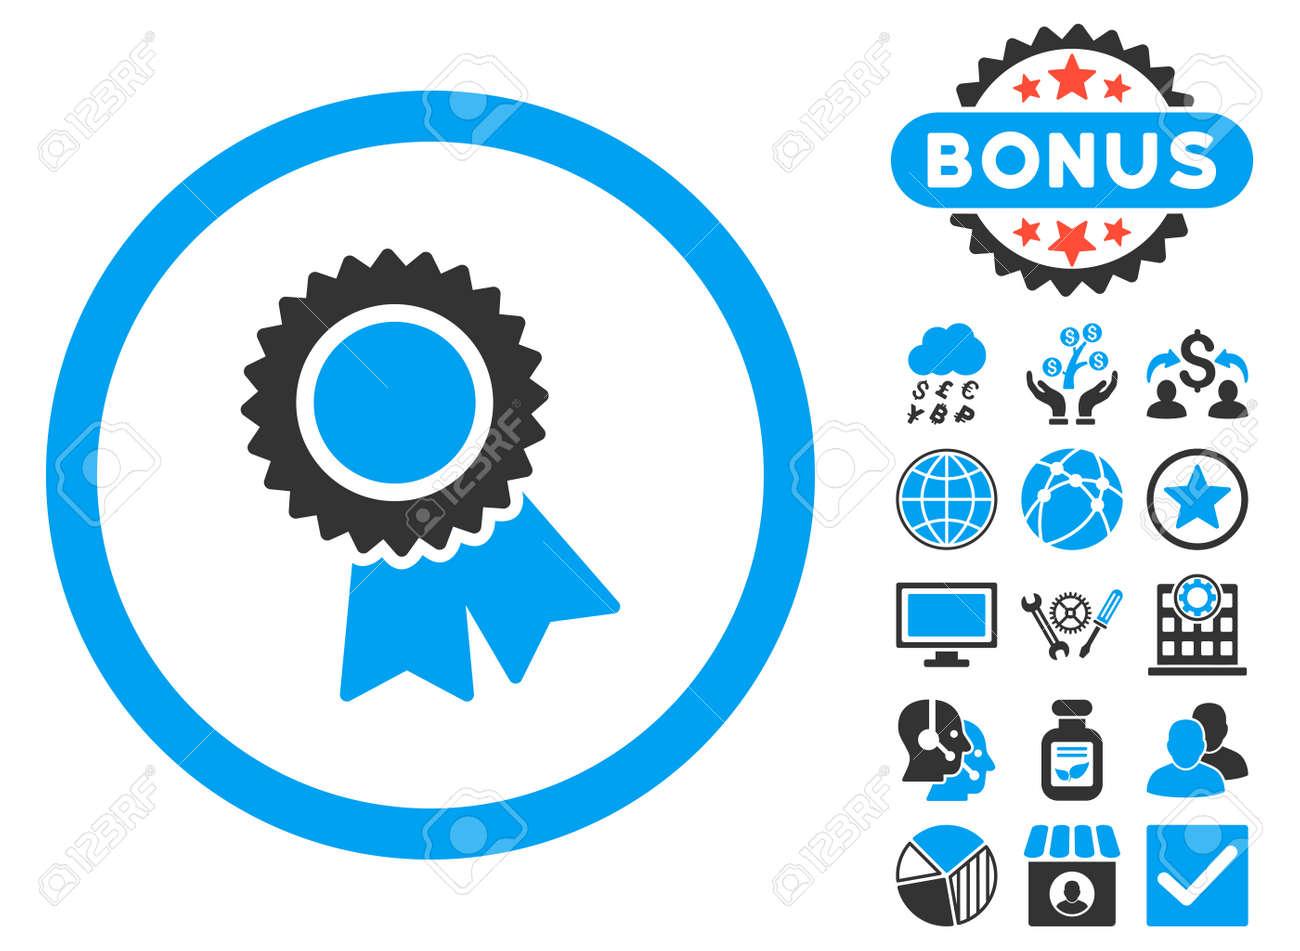 Certification Icon With Bonus Symbols Vector Illustration Style